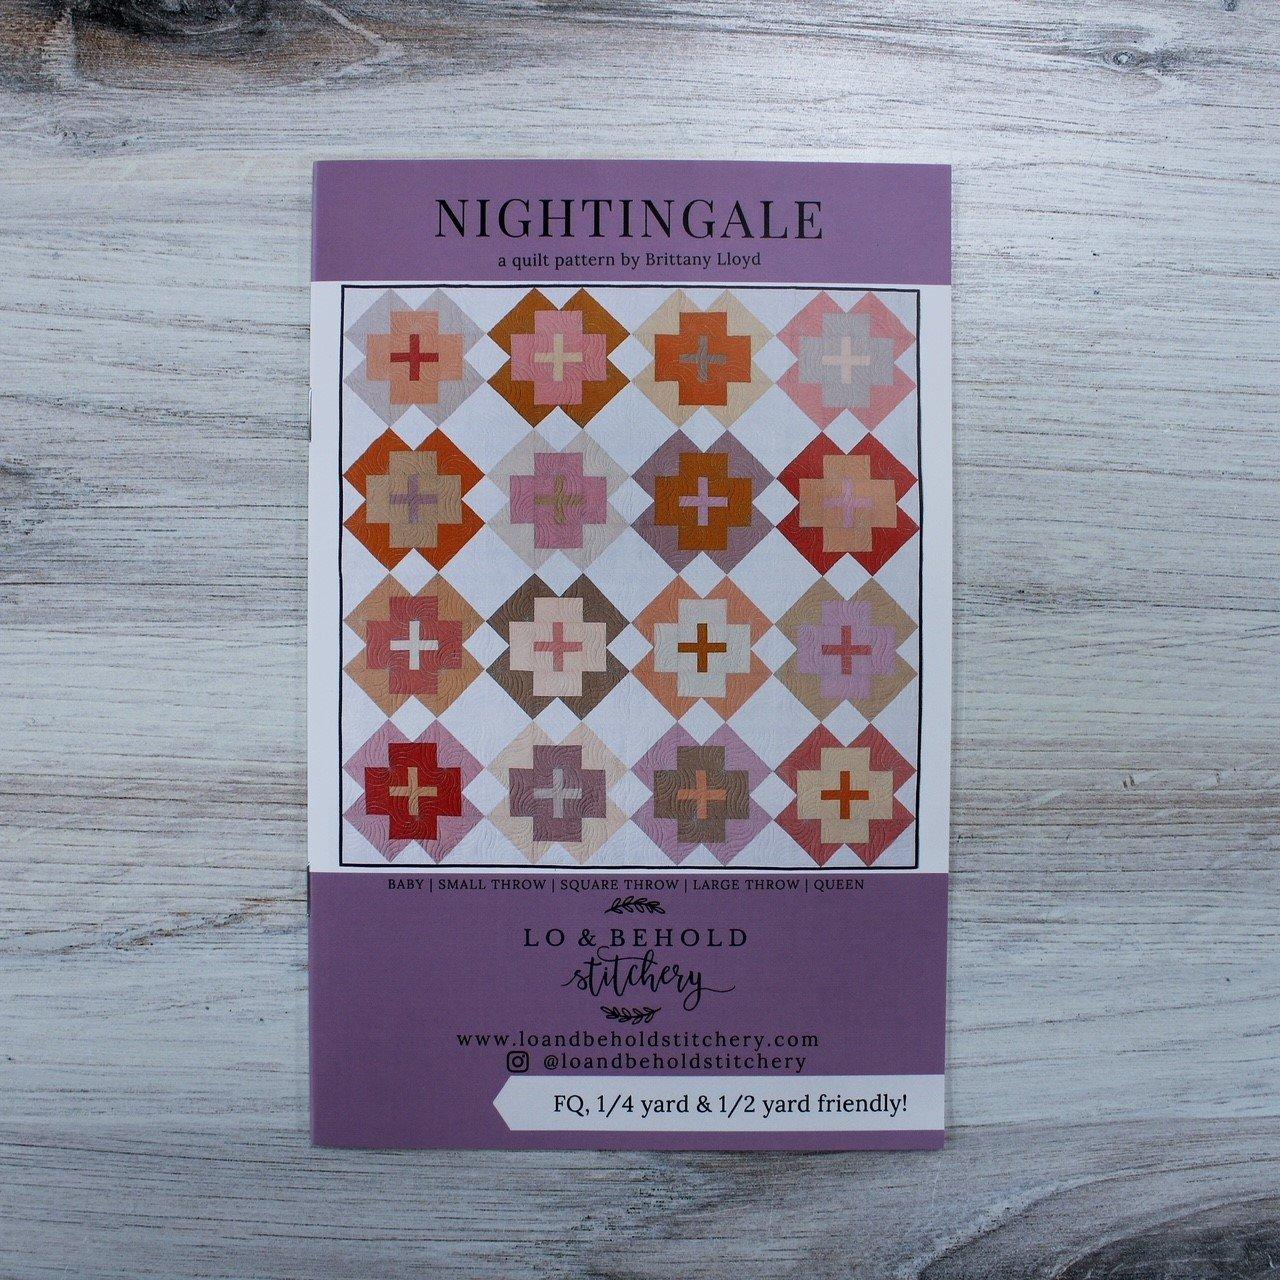 Nightingale Quilt Pattern